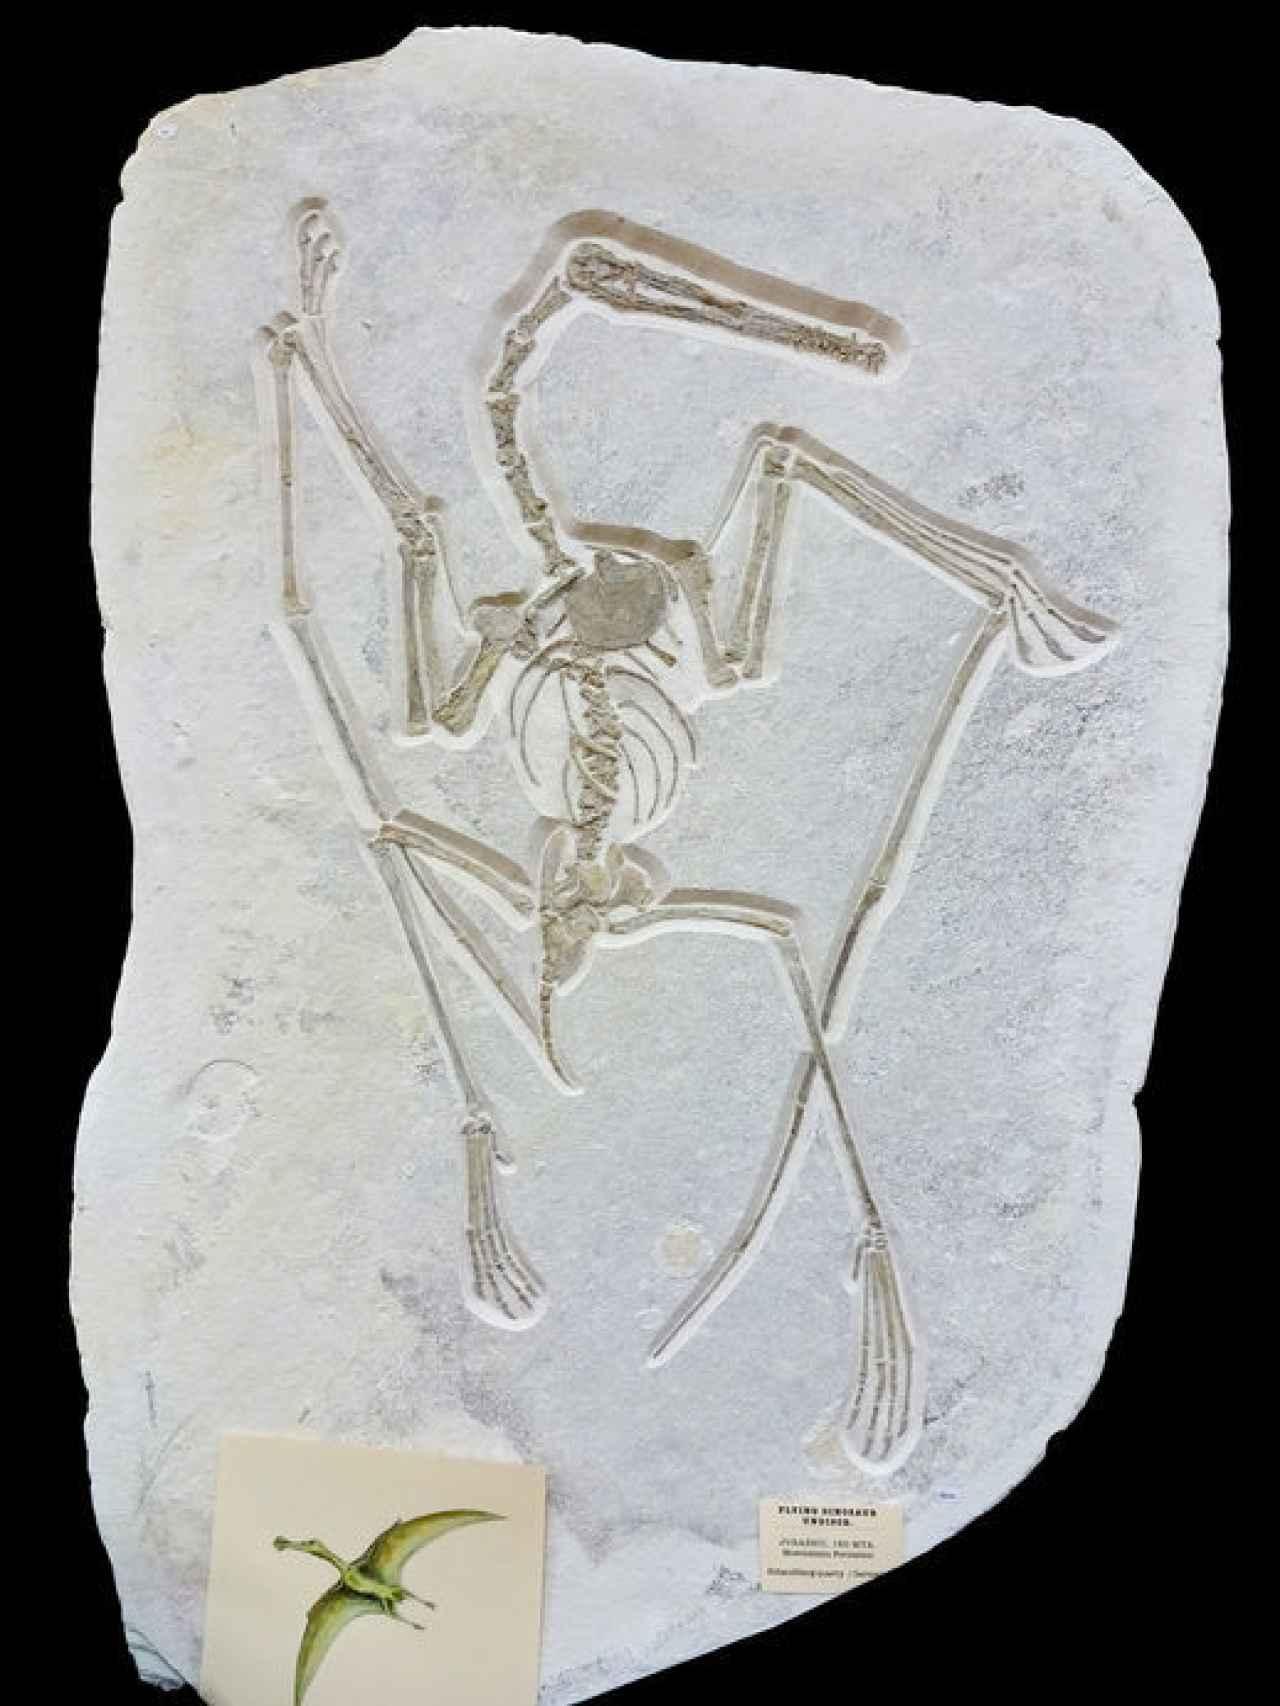 El pterosaurio retirado de la subasta.